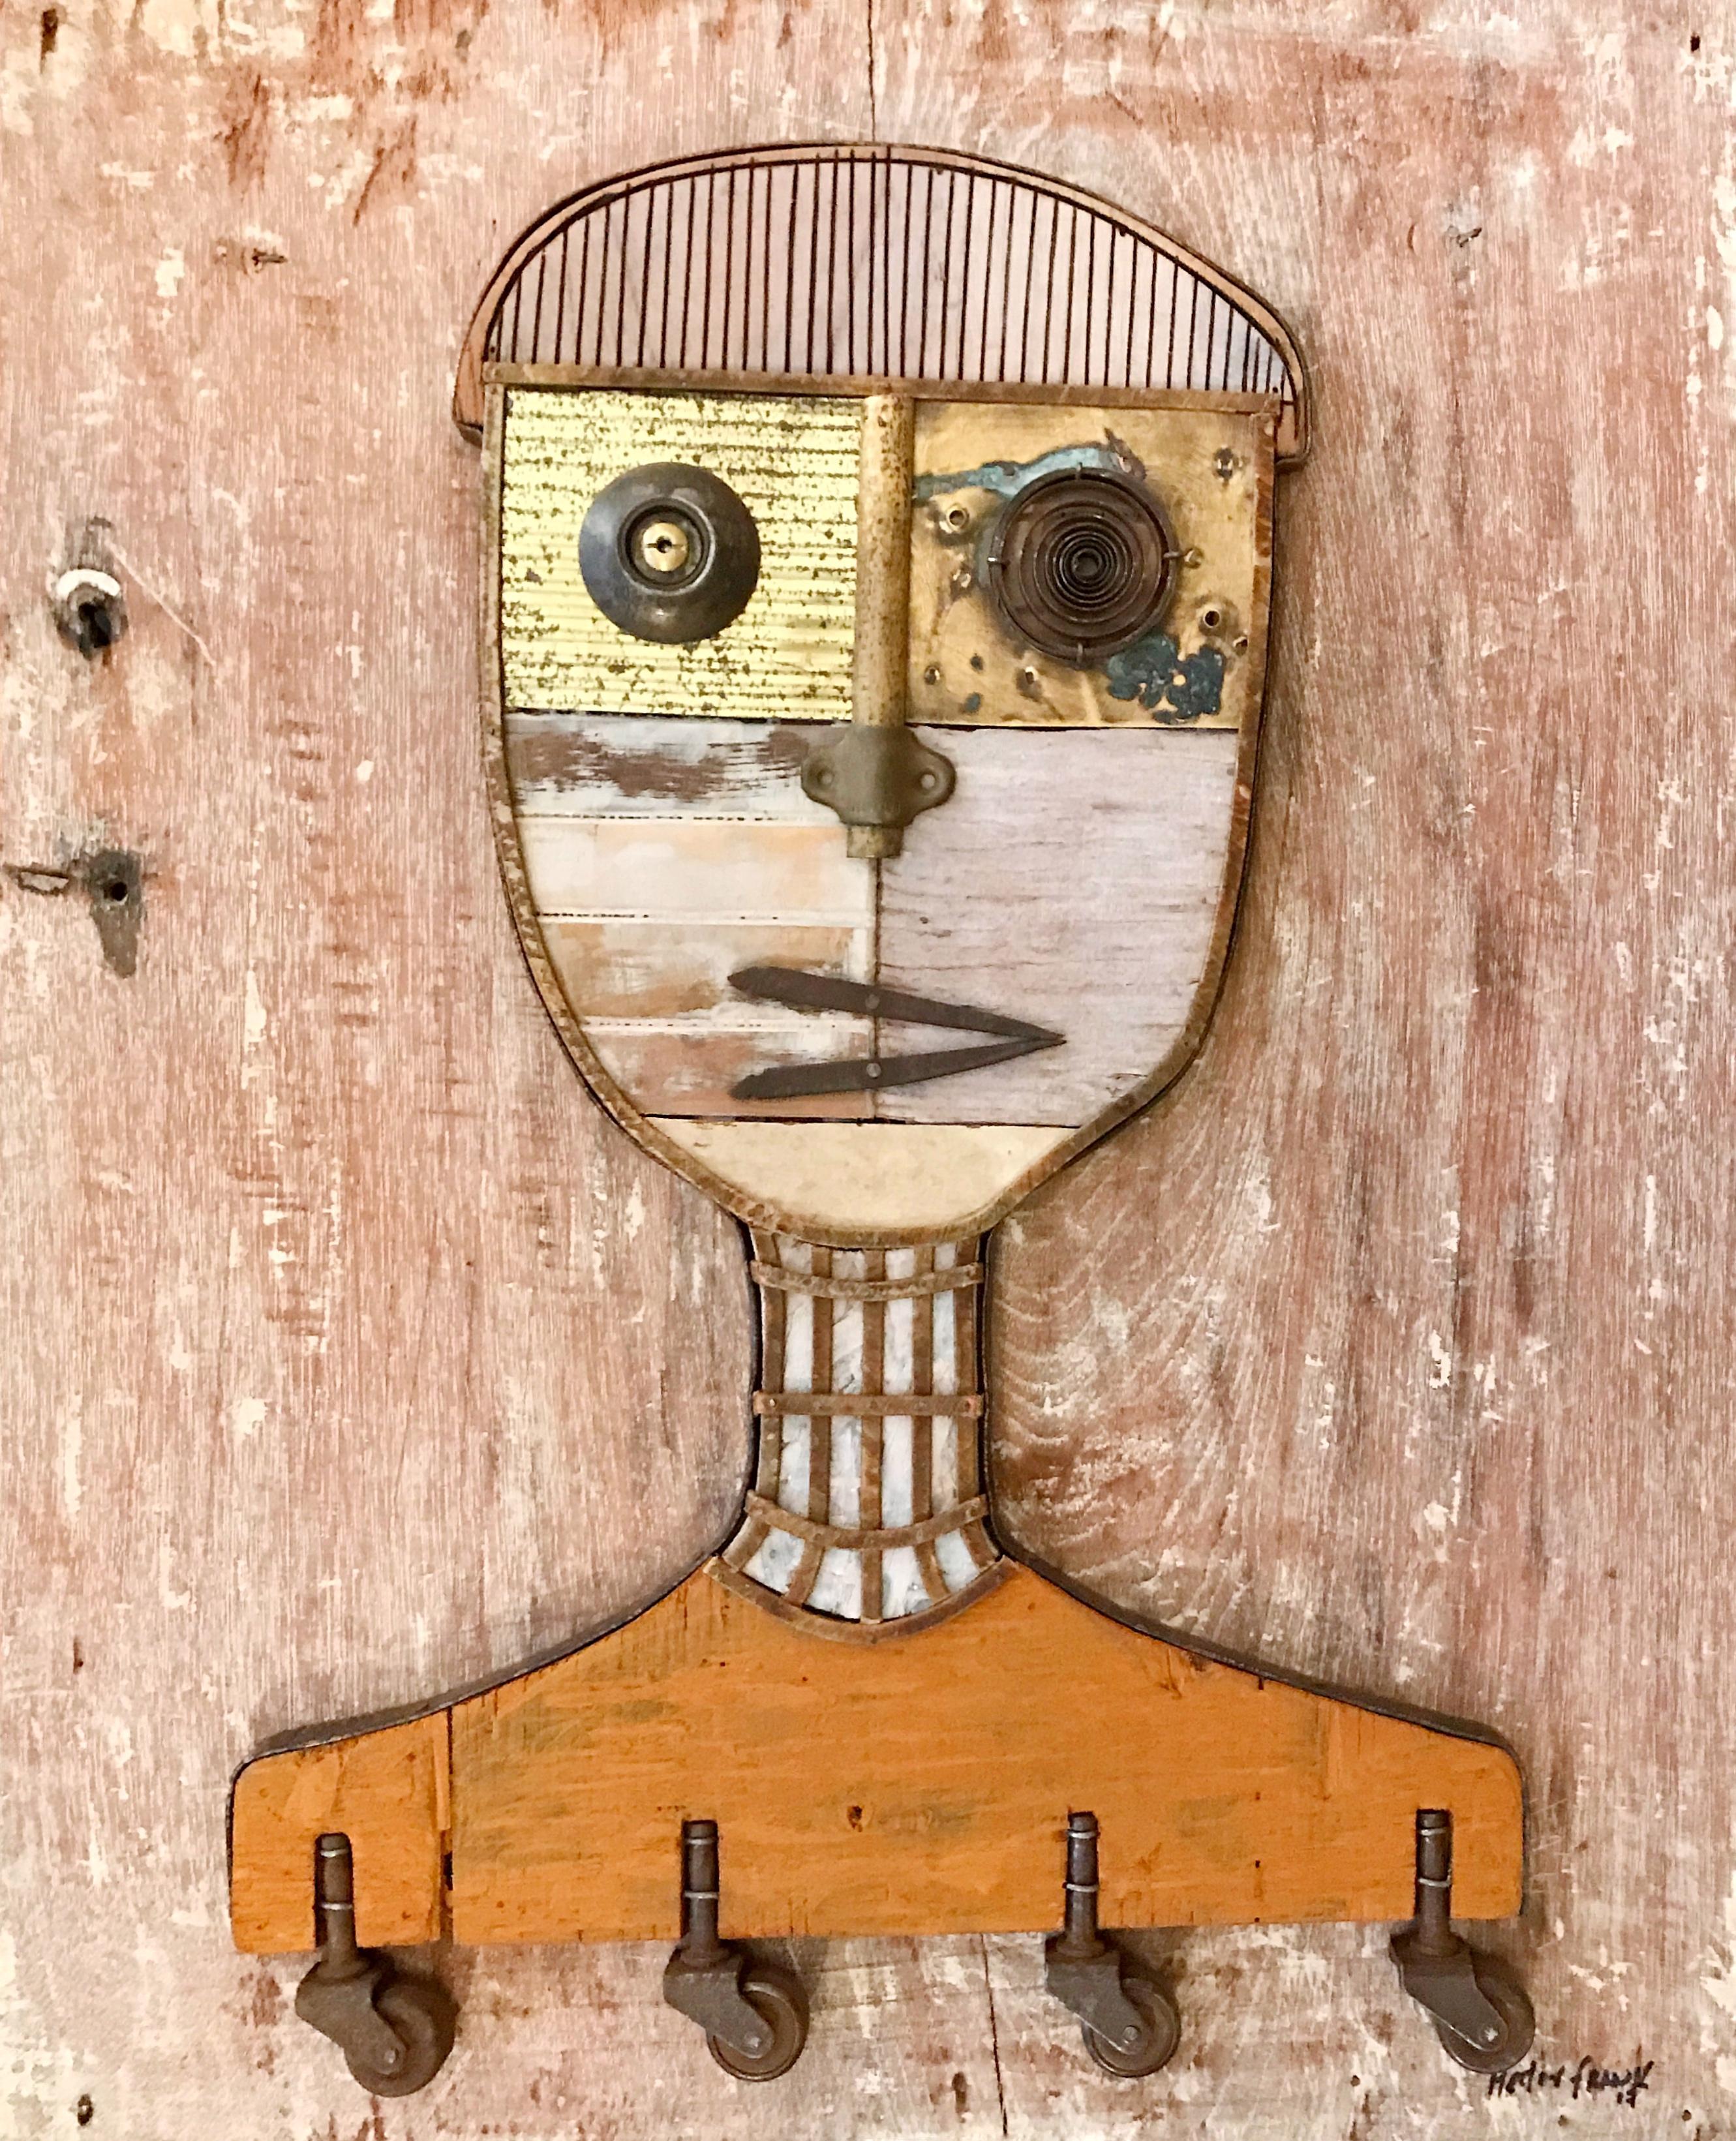 Hector Frank's Cuban Figurative Portrait on Wood